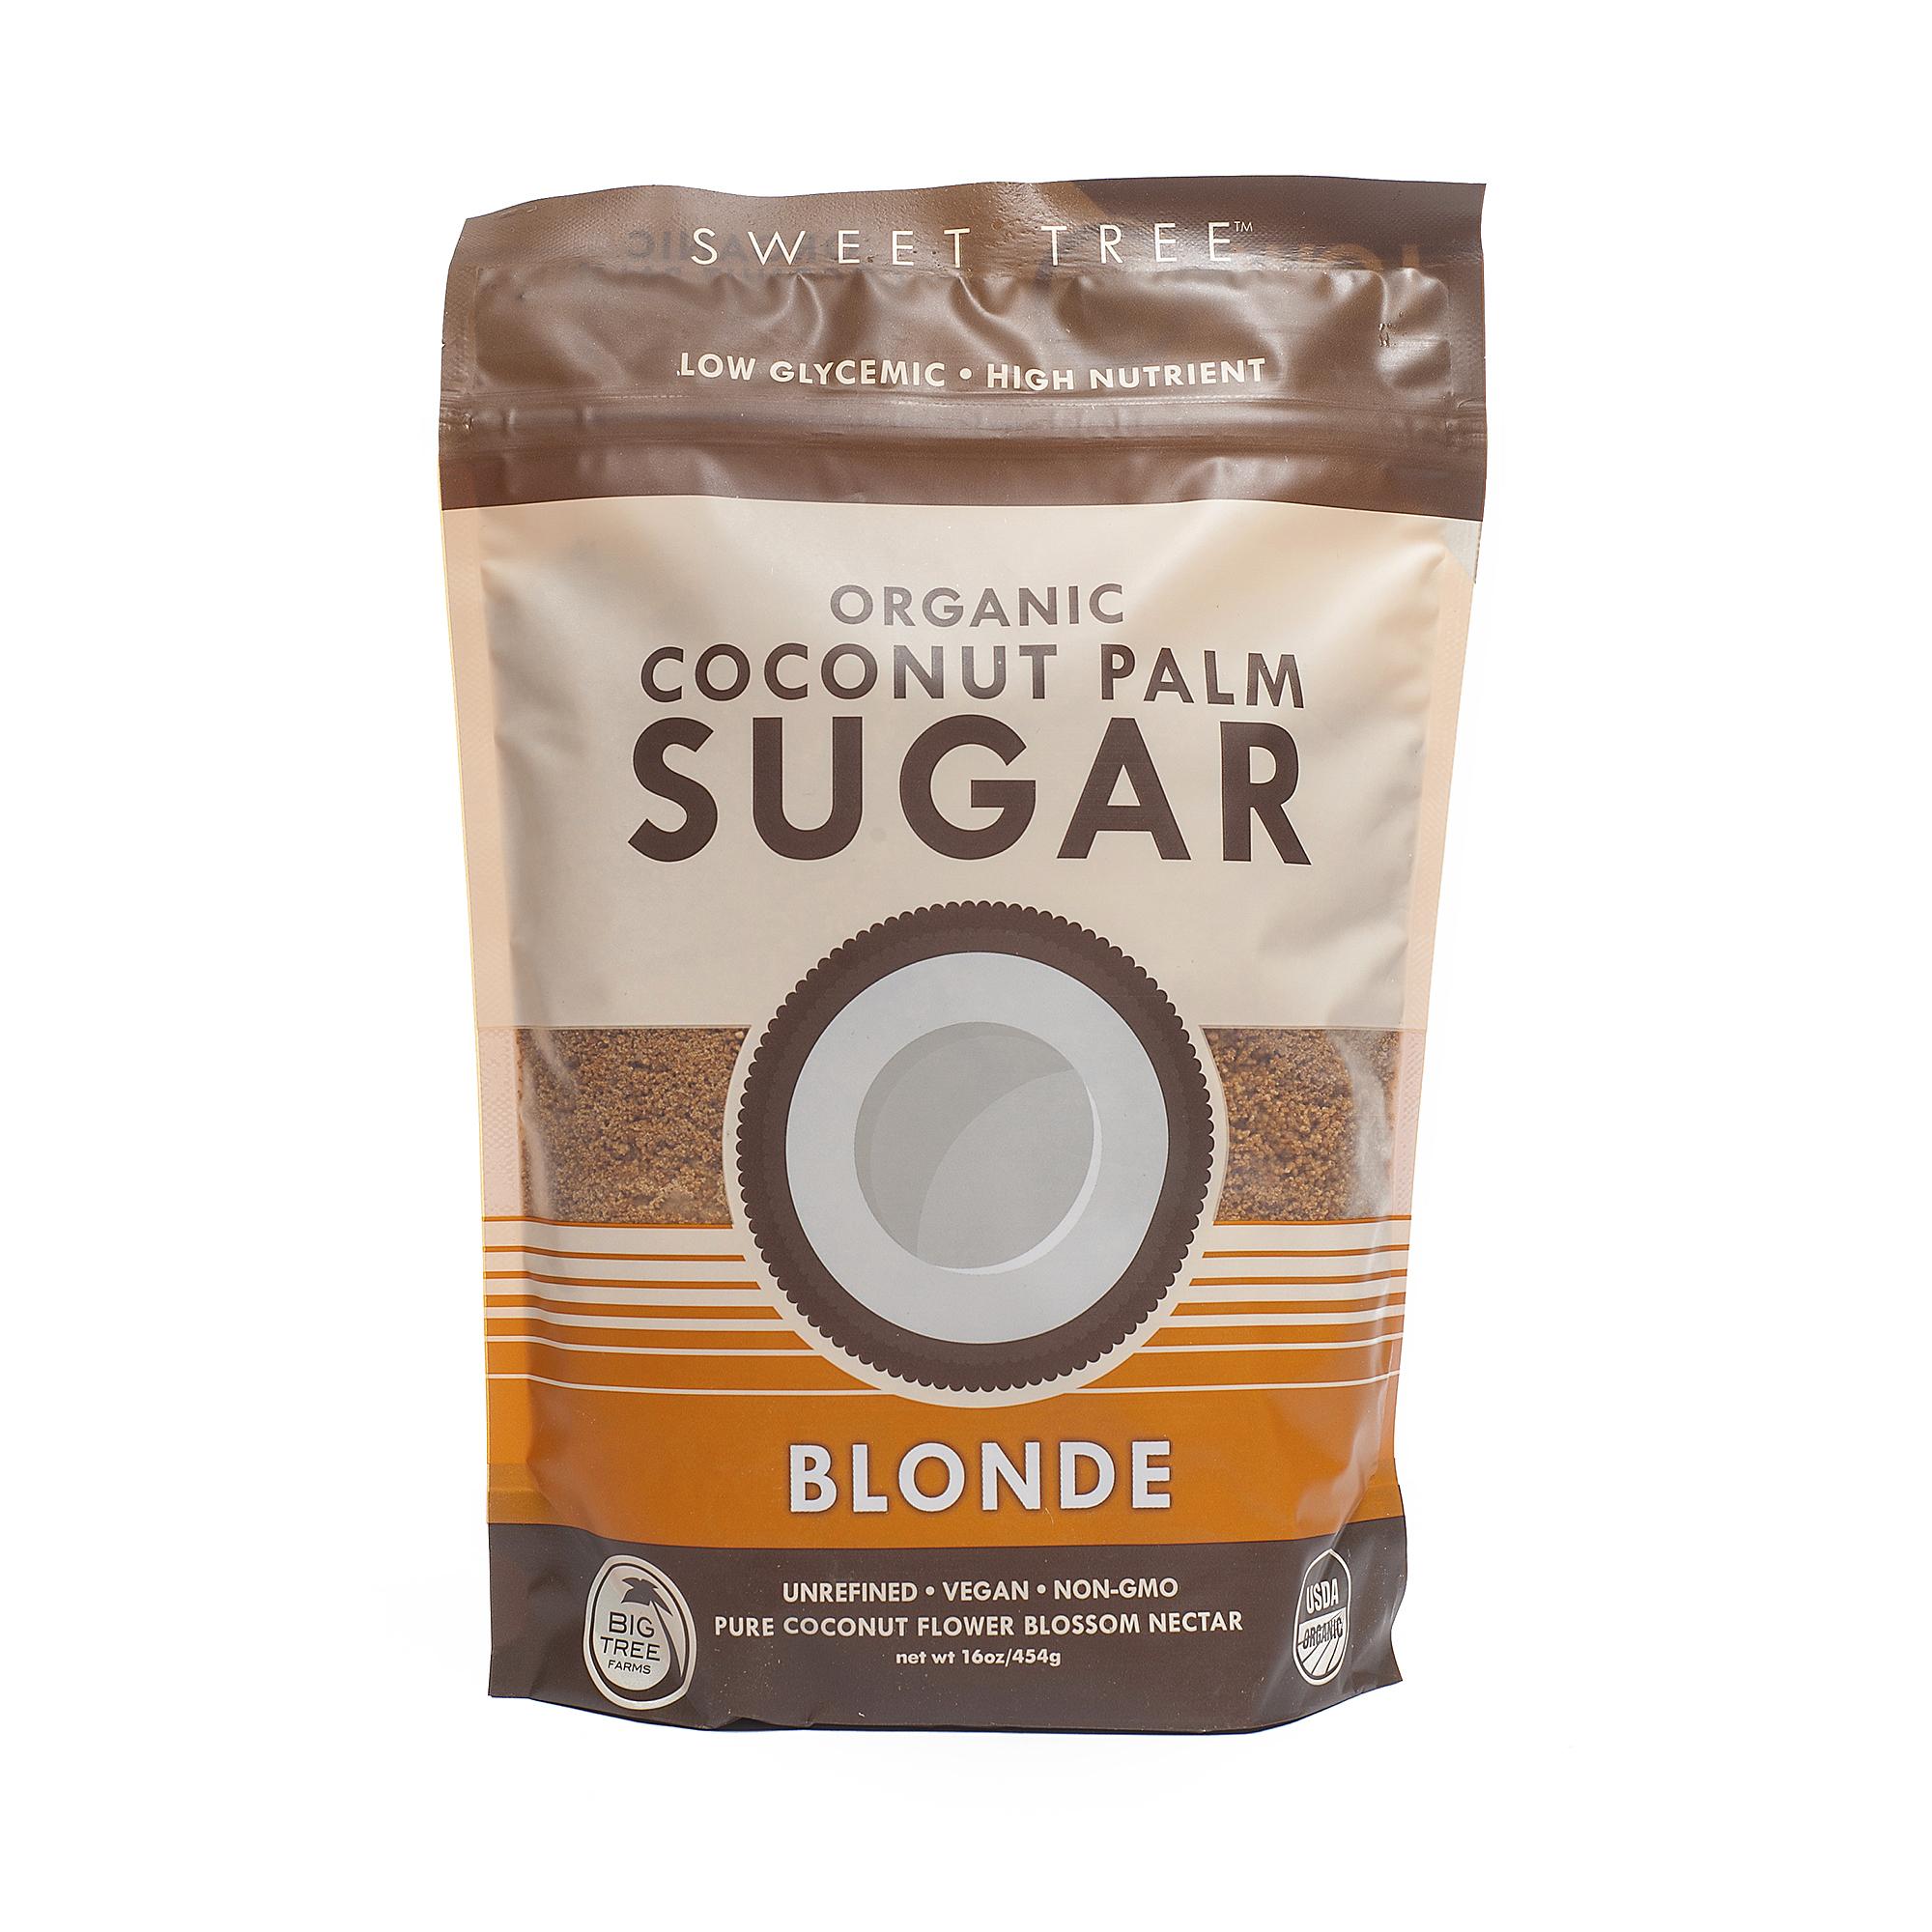 Coconut Plam Sugar